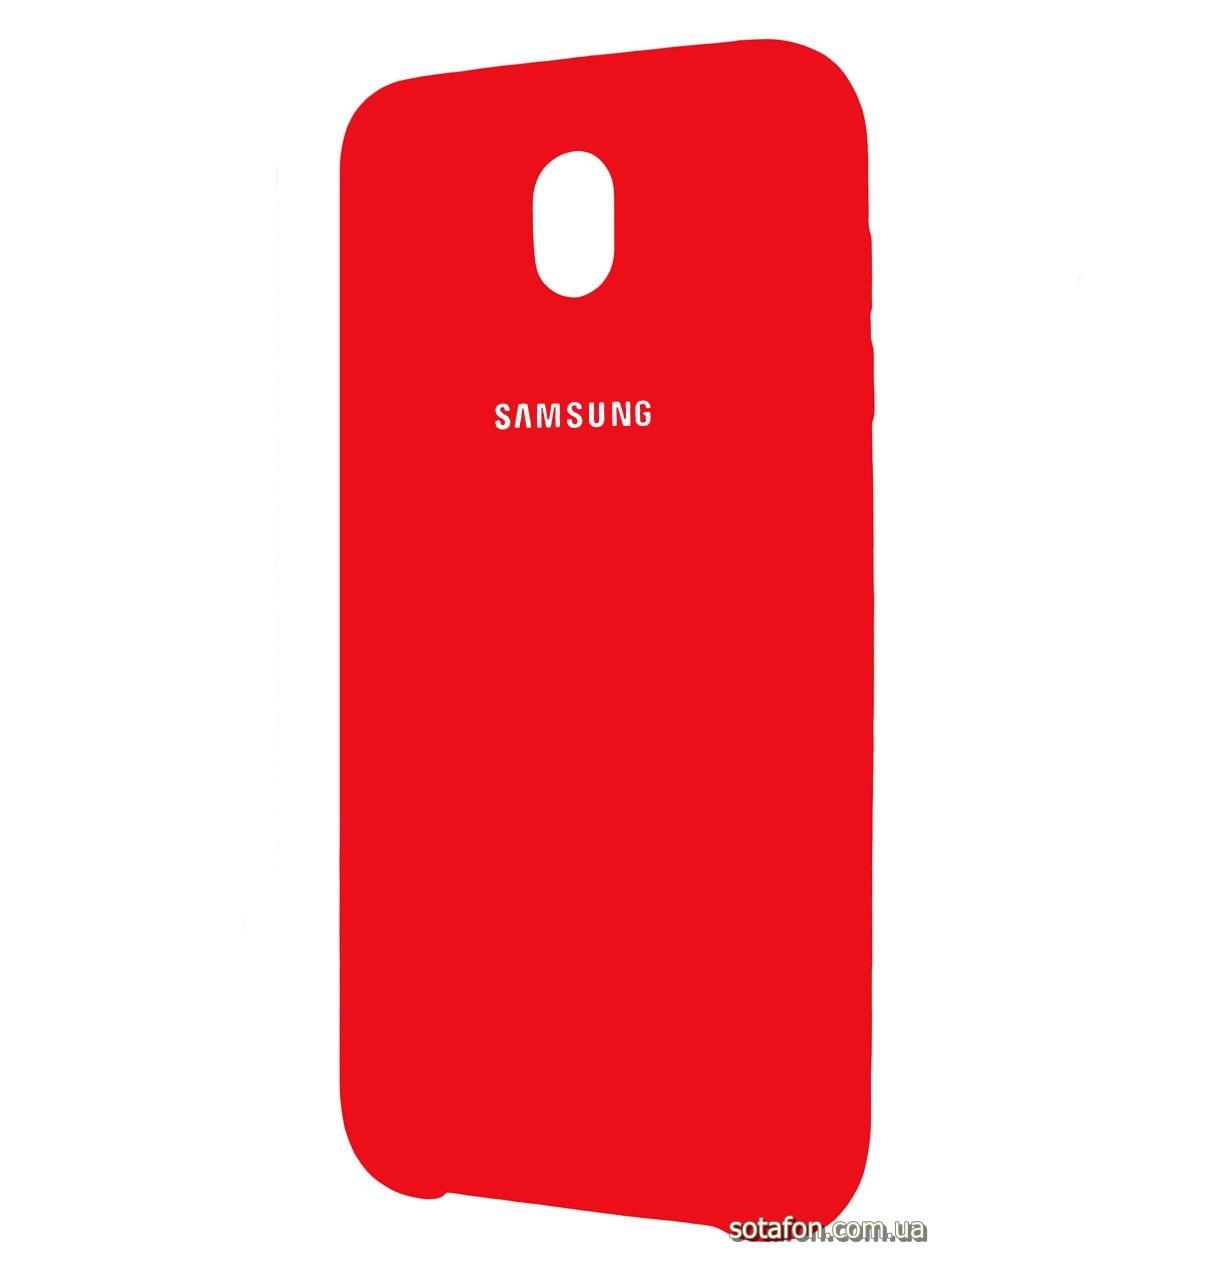 Чехол-накладка Original Silicone case на Samsung Galaxy J7 (2017) SM-J730F Red